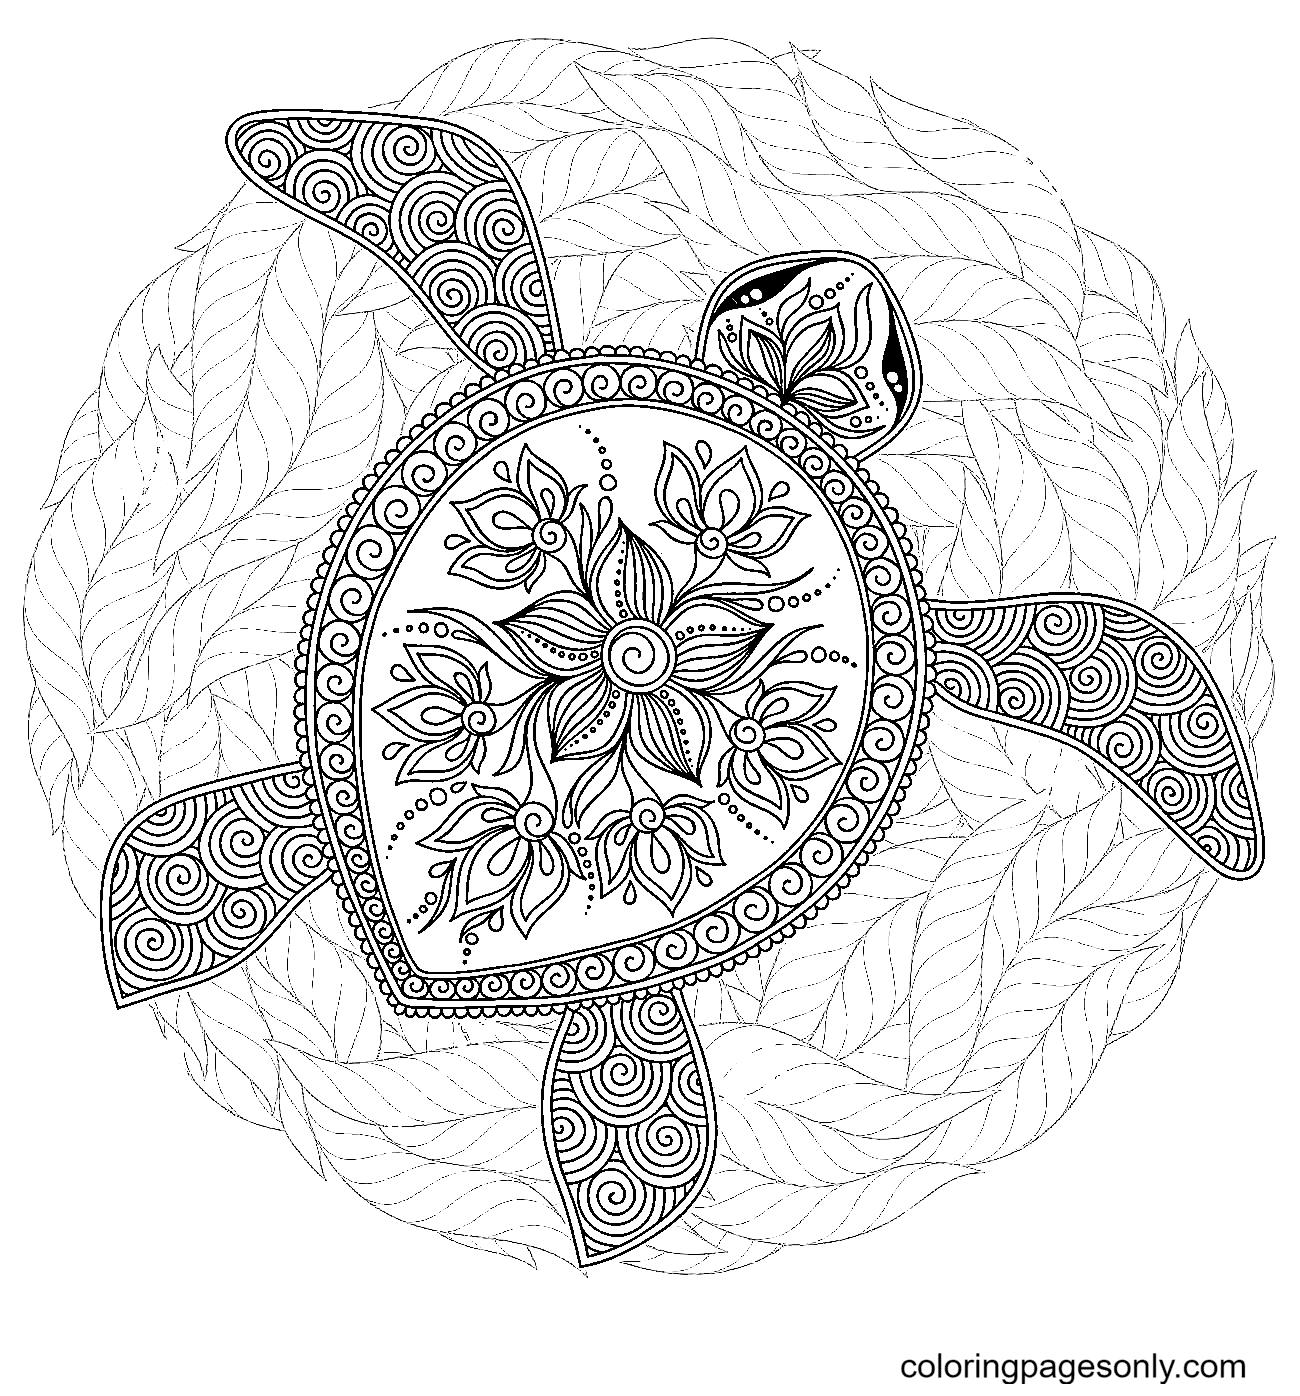 Adorable Sea Turtle Coloring Page